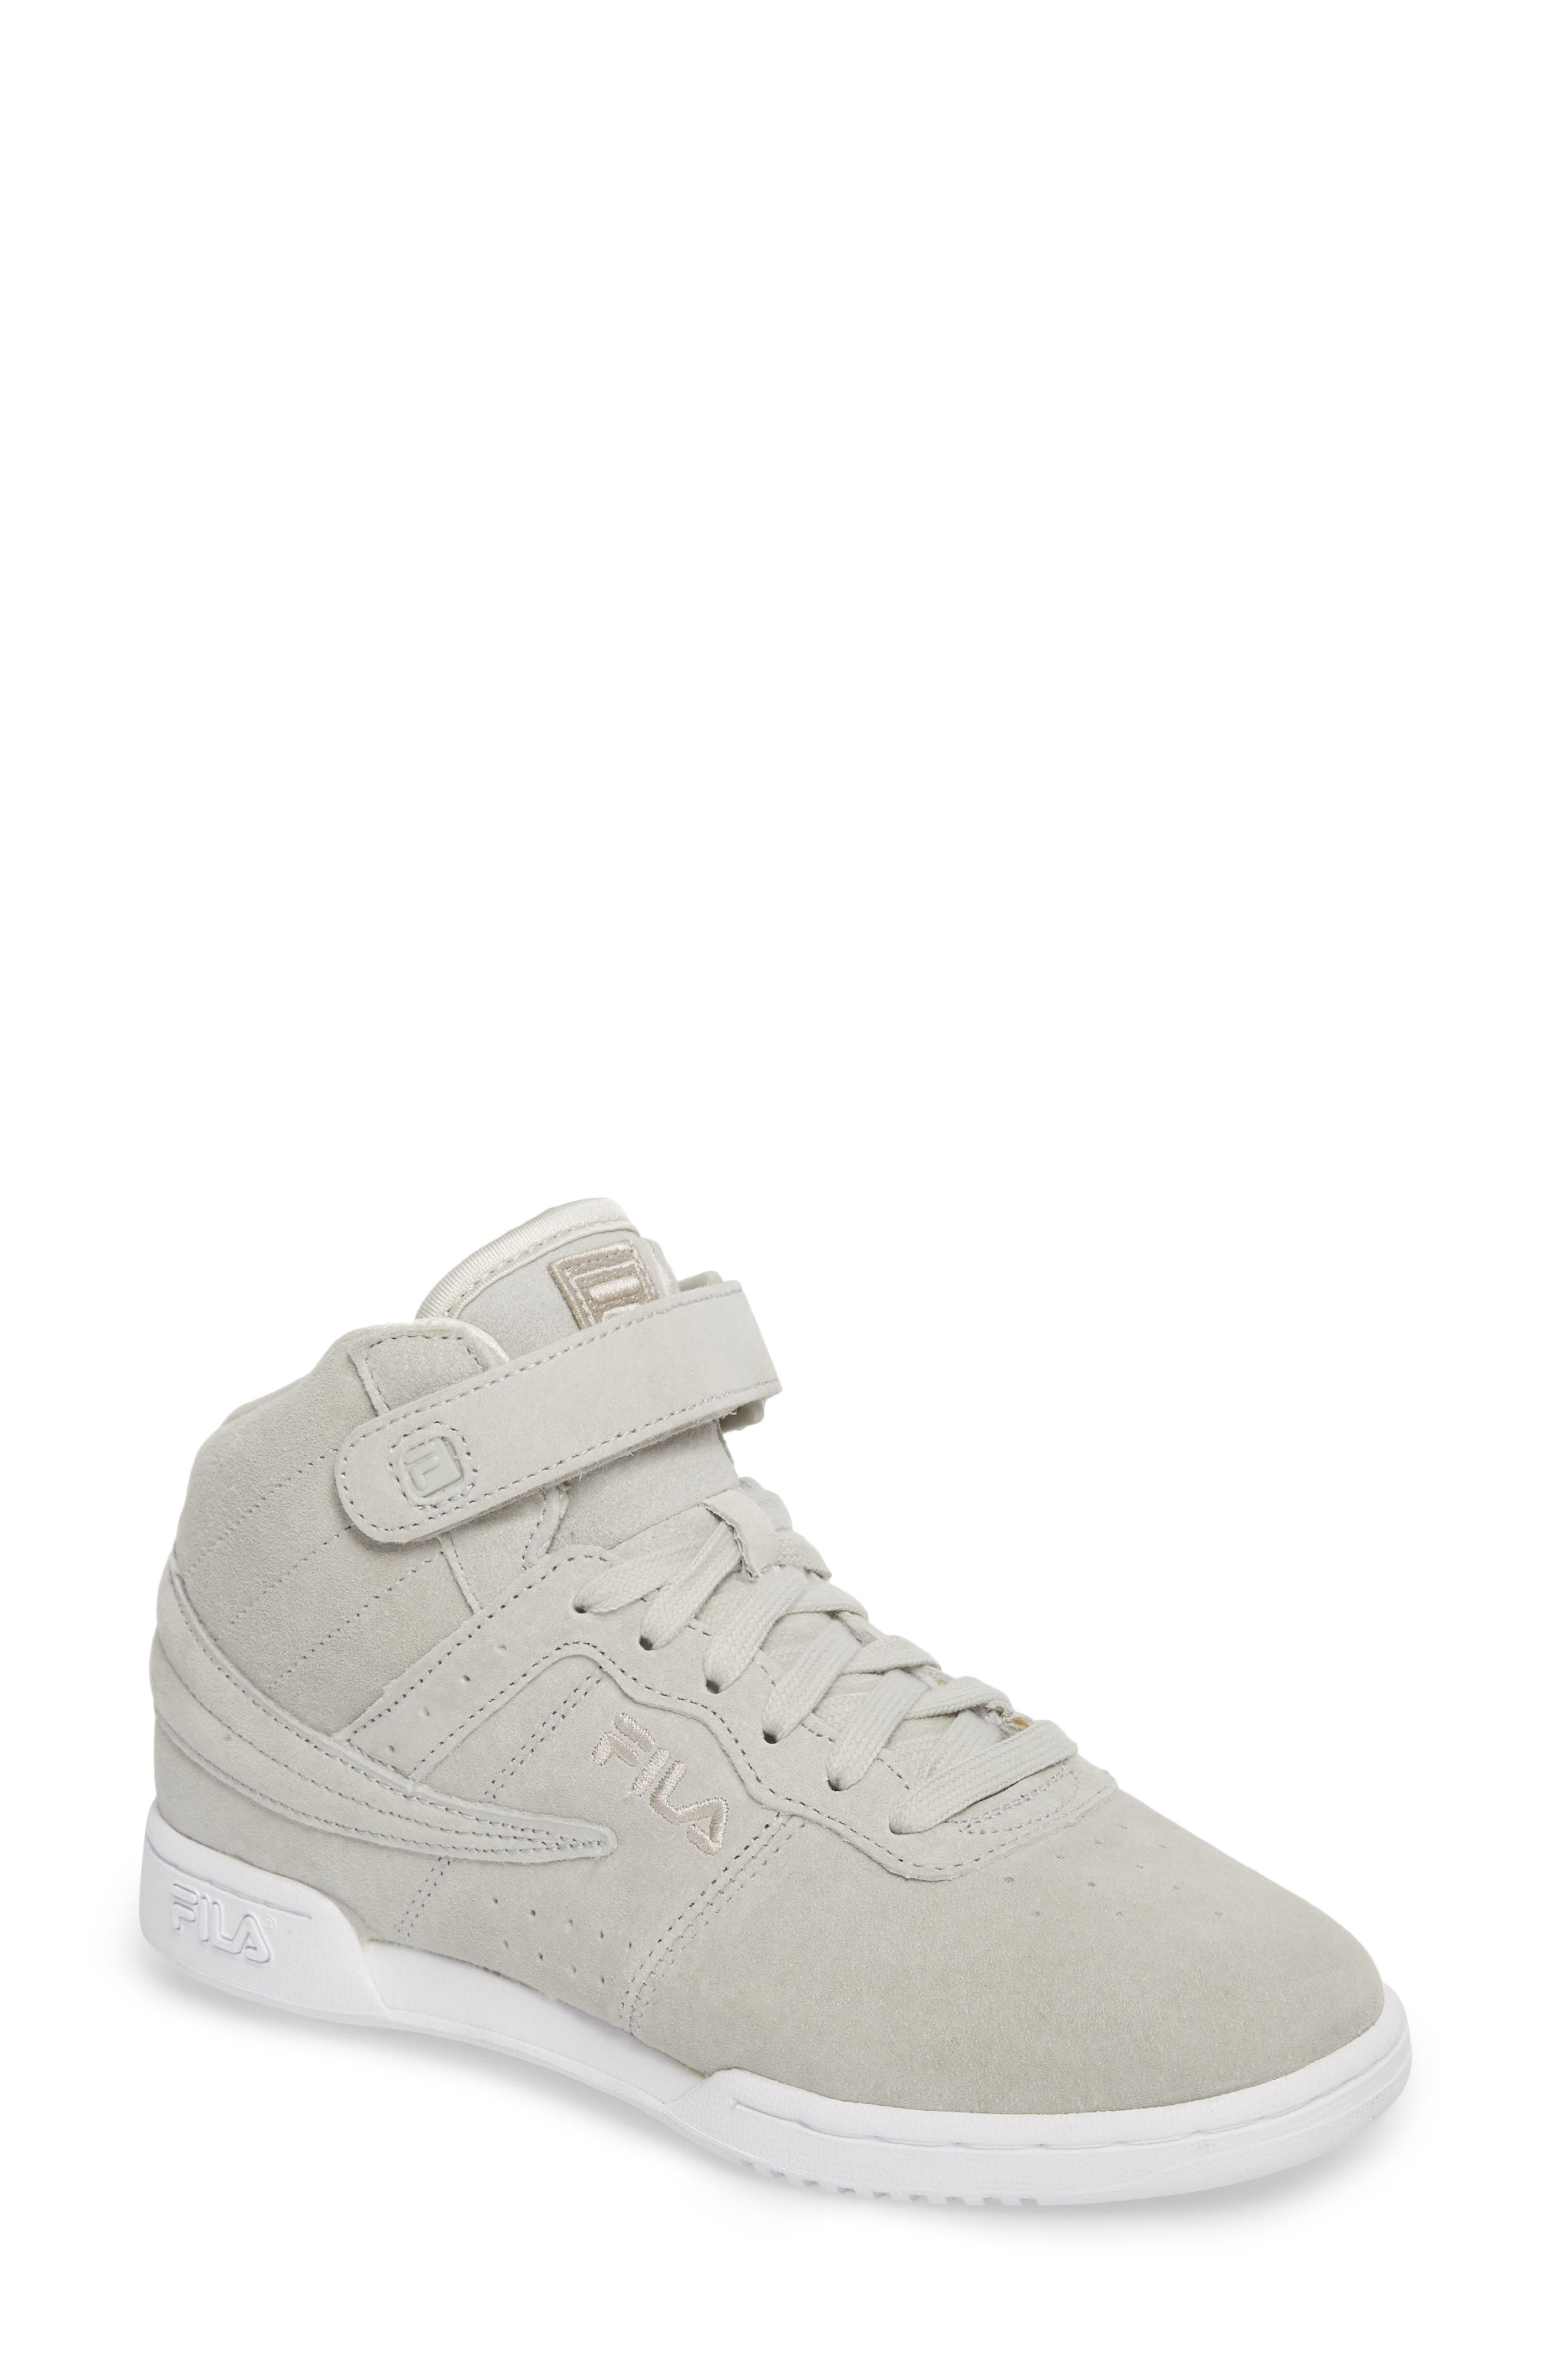 F-13 Premium Mid Top Sneaker,                             Main thumbnail 1, color,                             White